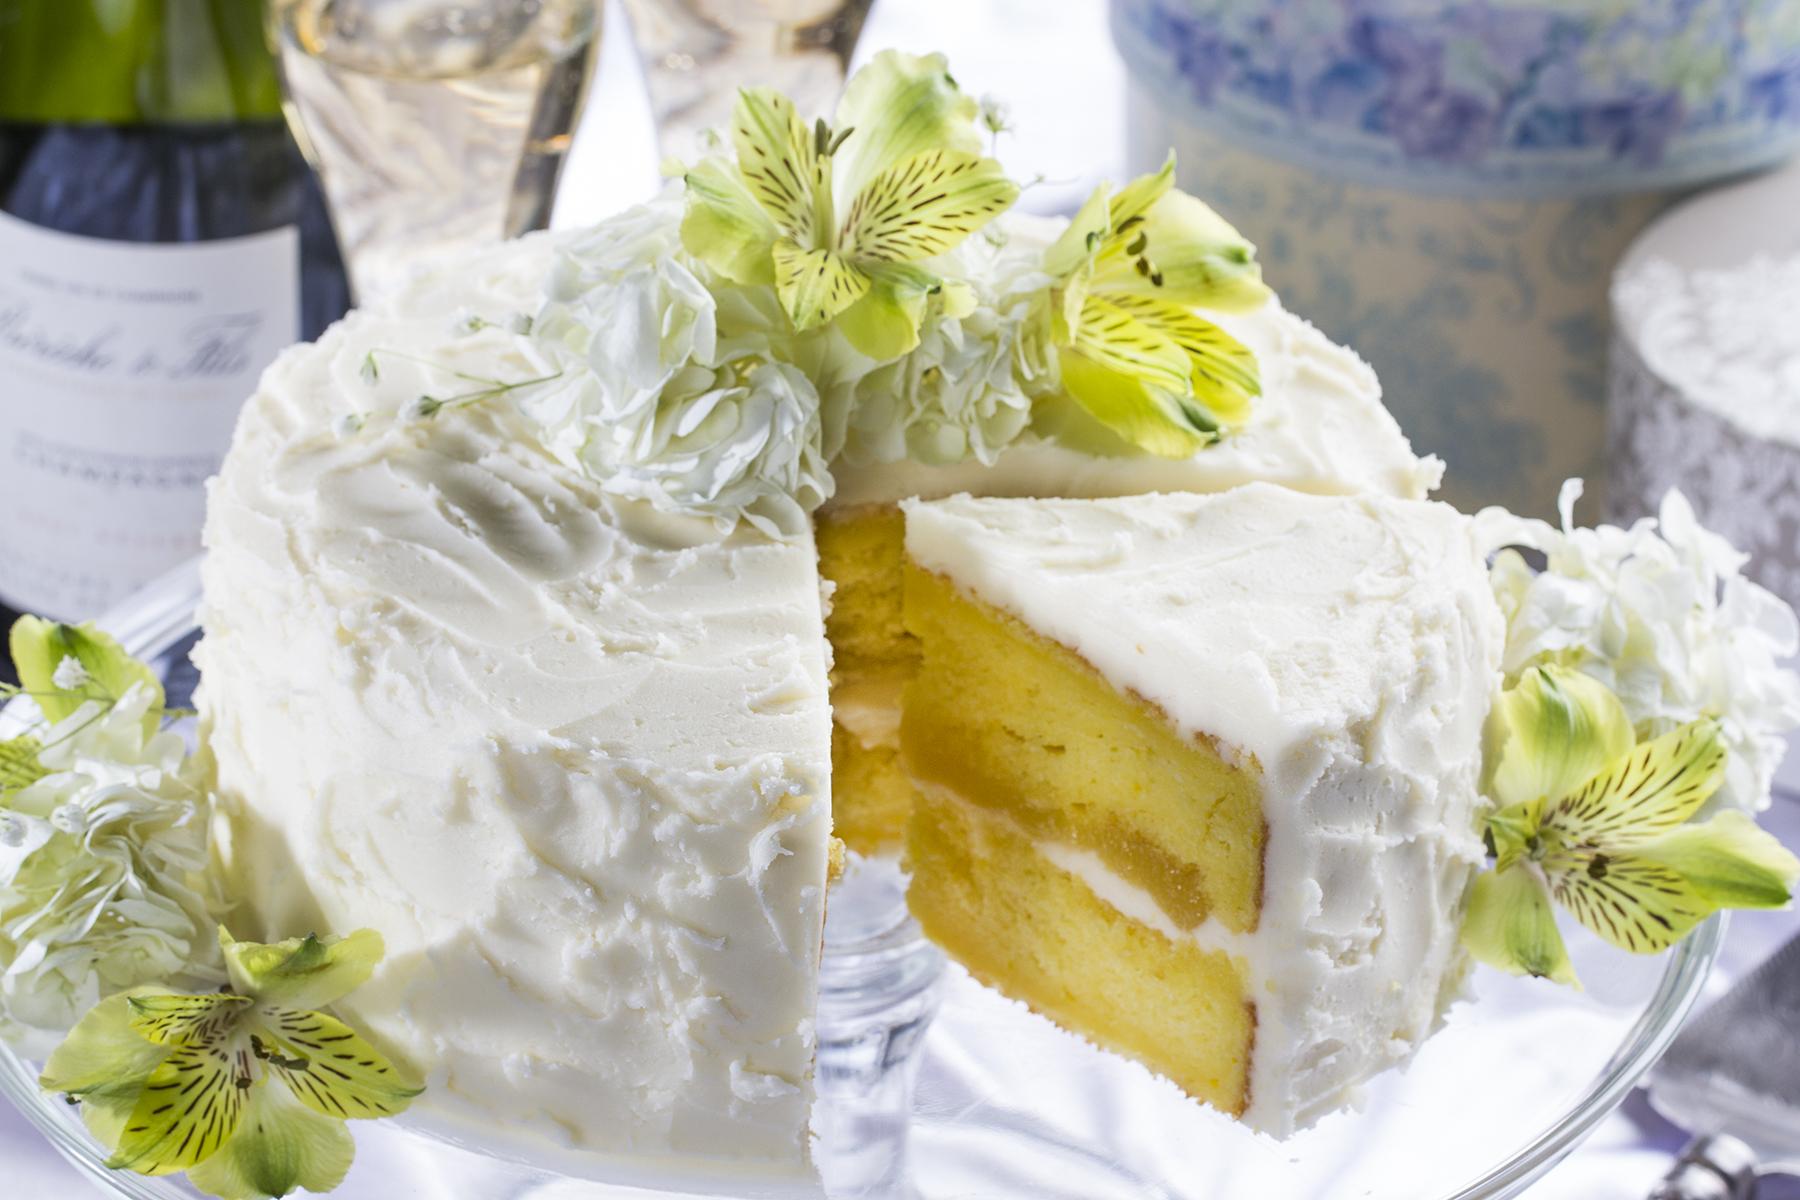 lemon wedding cake mrfood com lemon wedding cake mrfood com